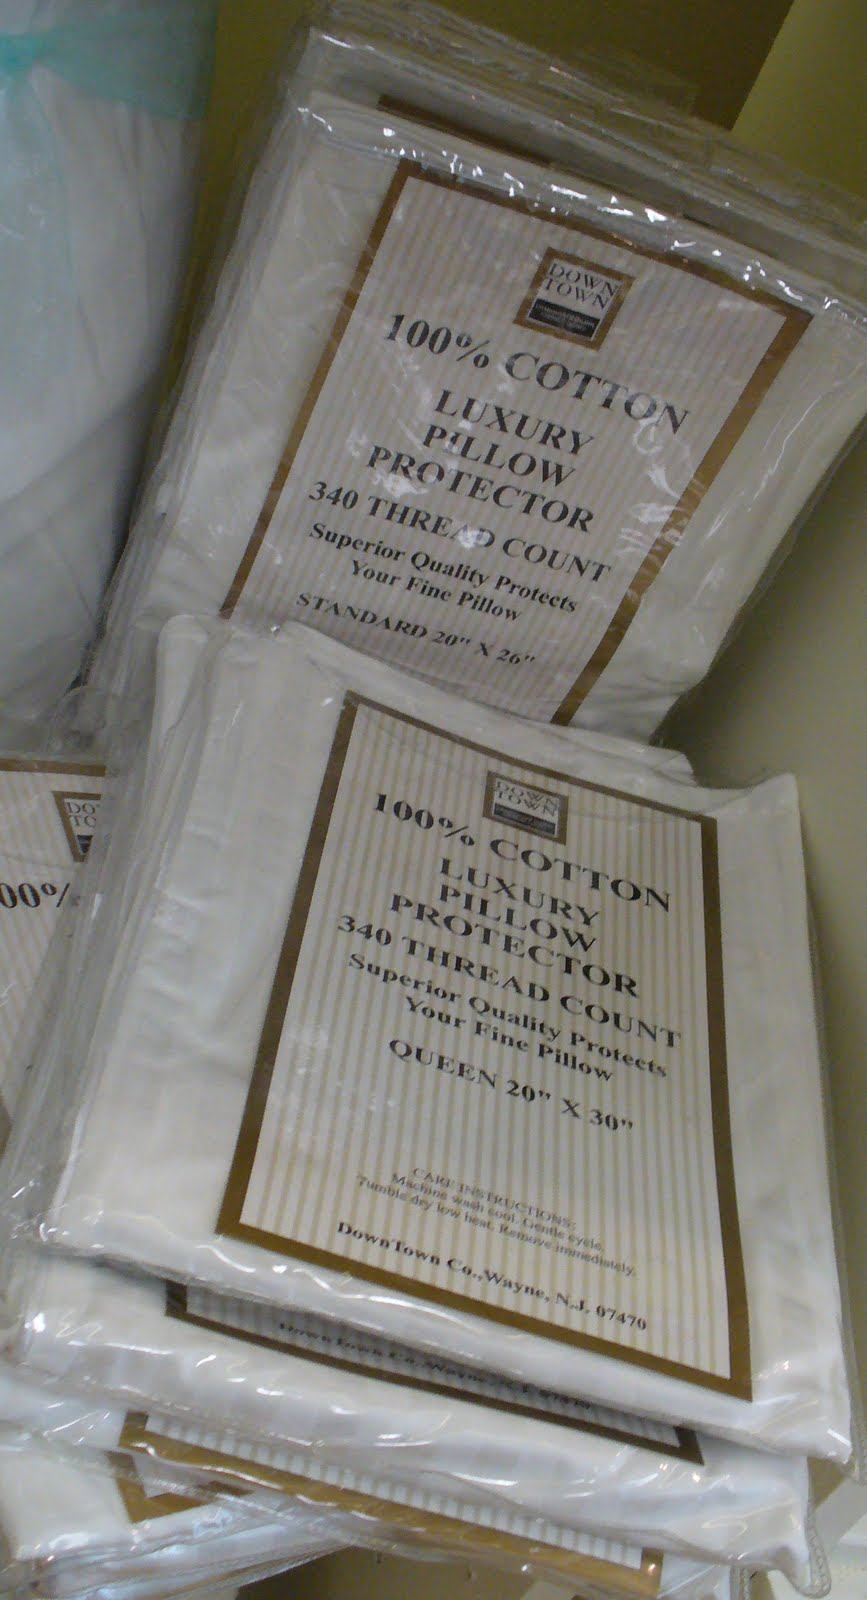 The Virginia Gail Collection